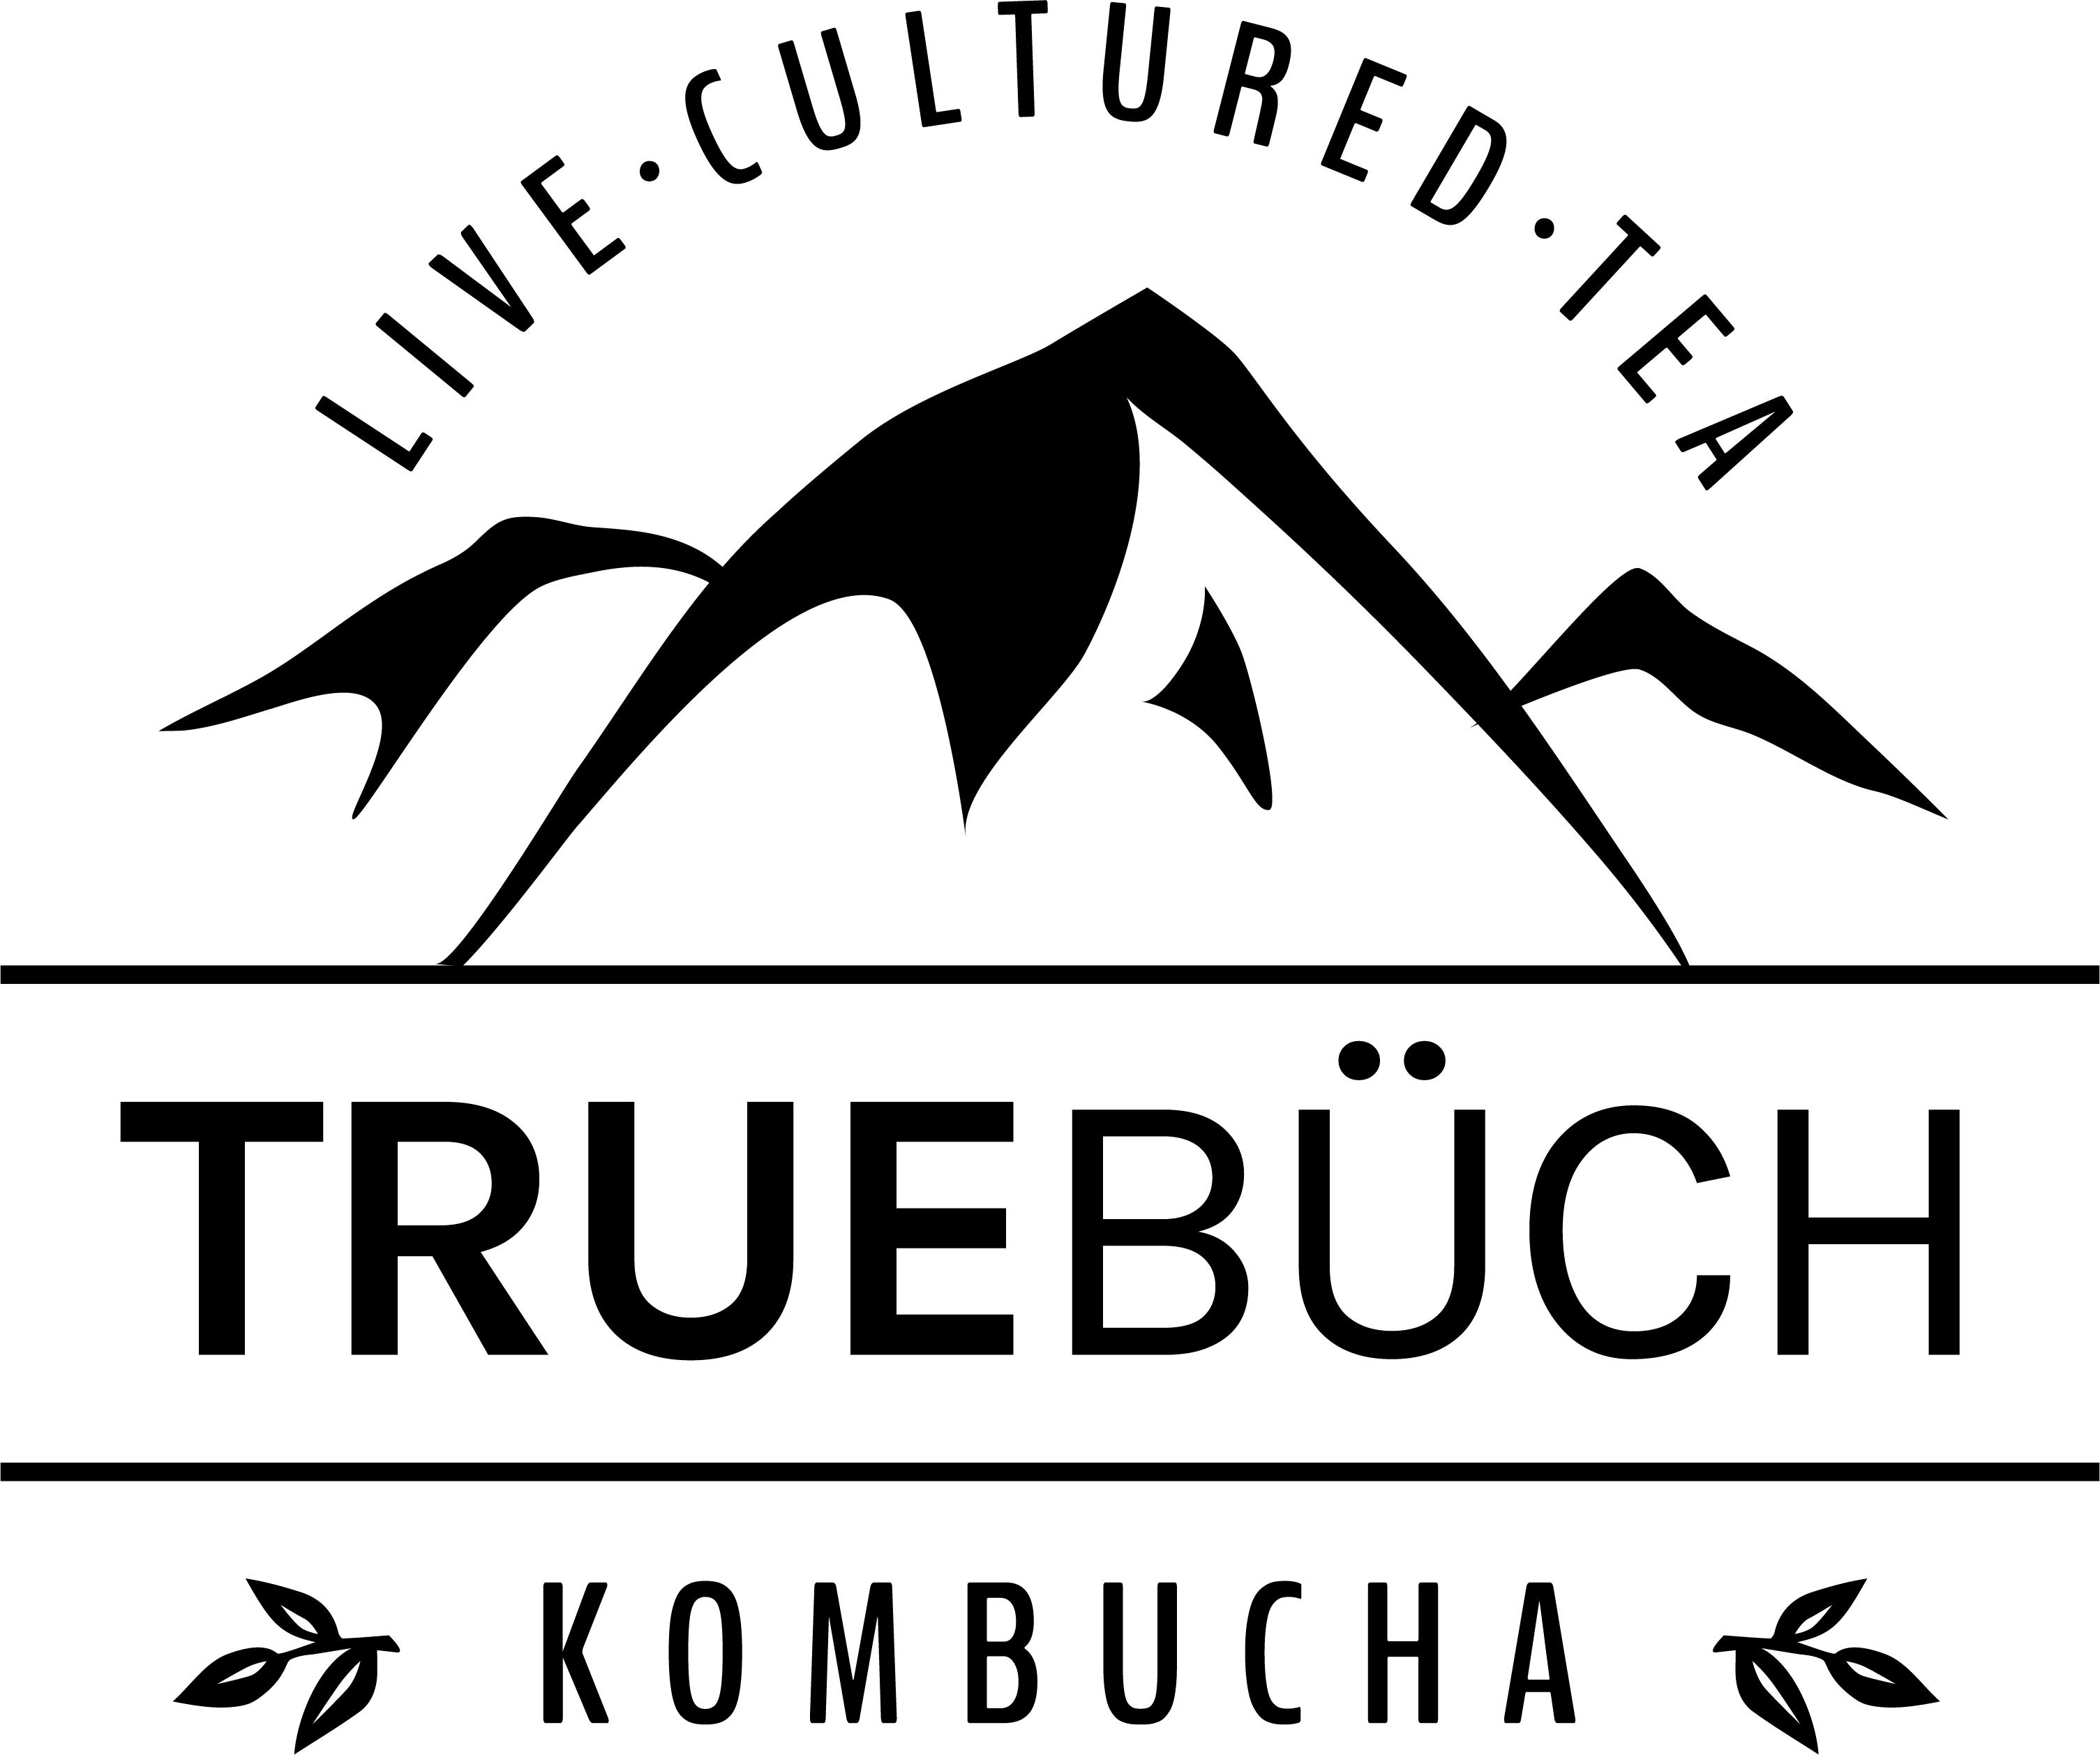 TRAMBUCHA